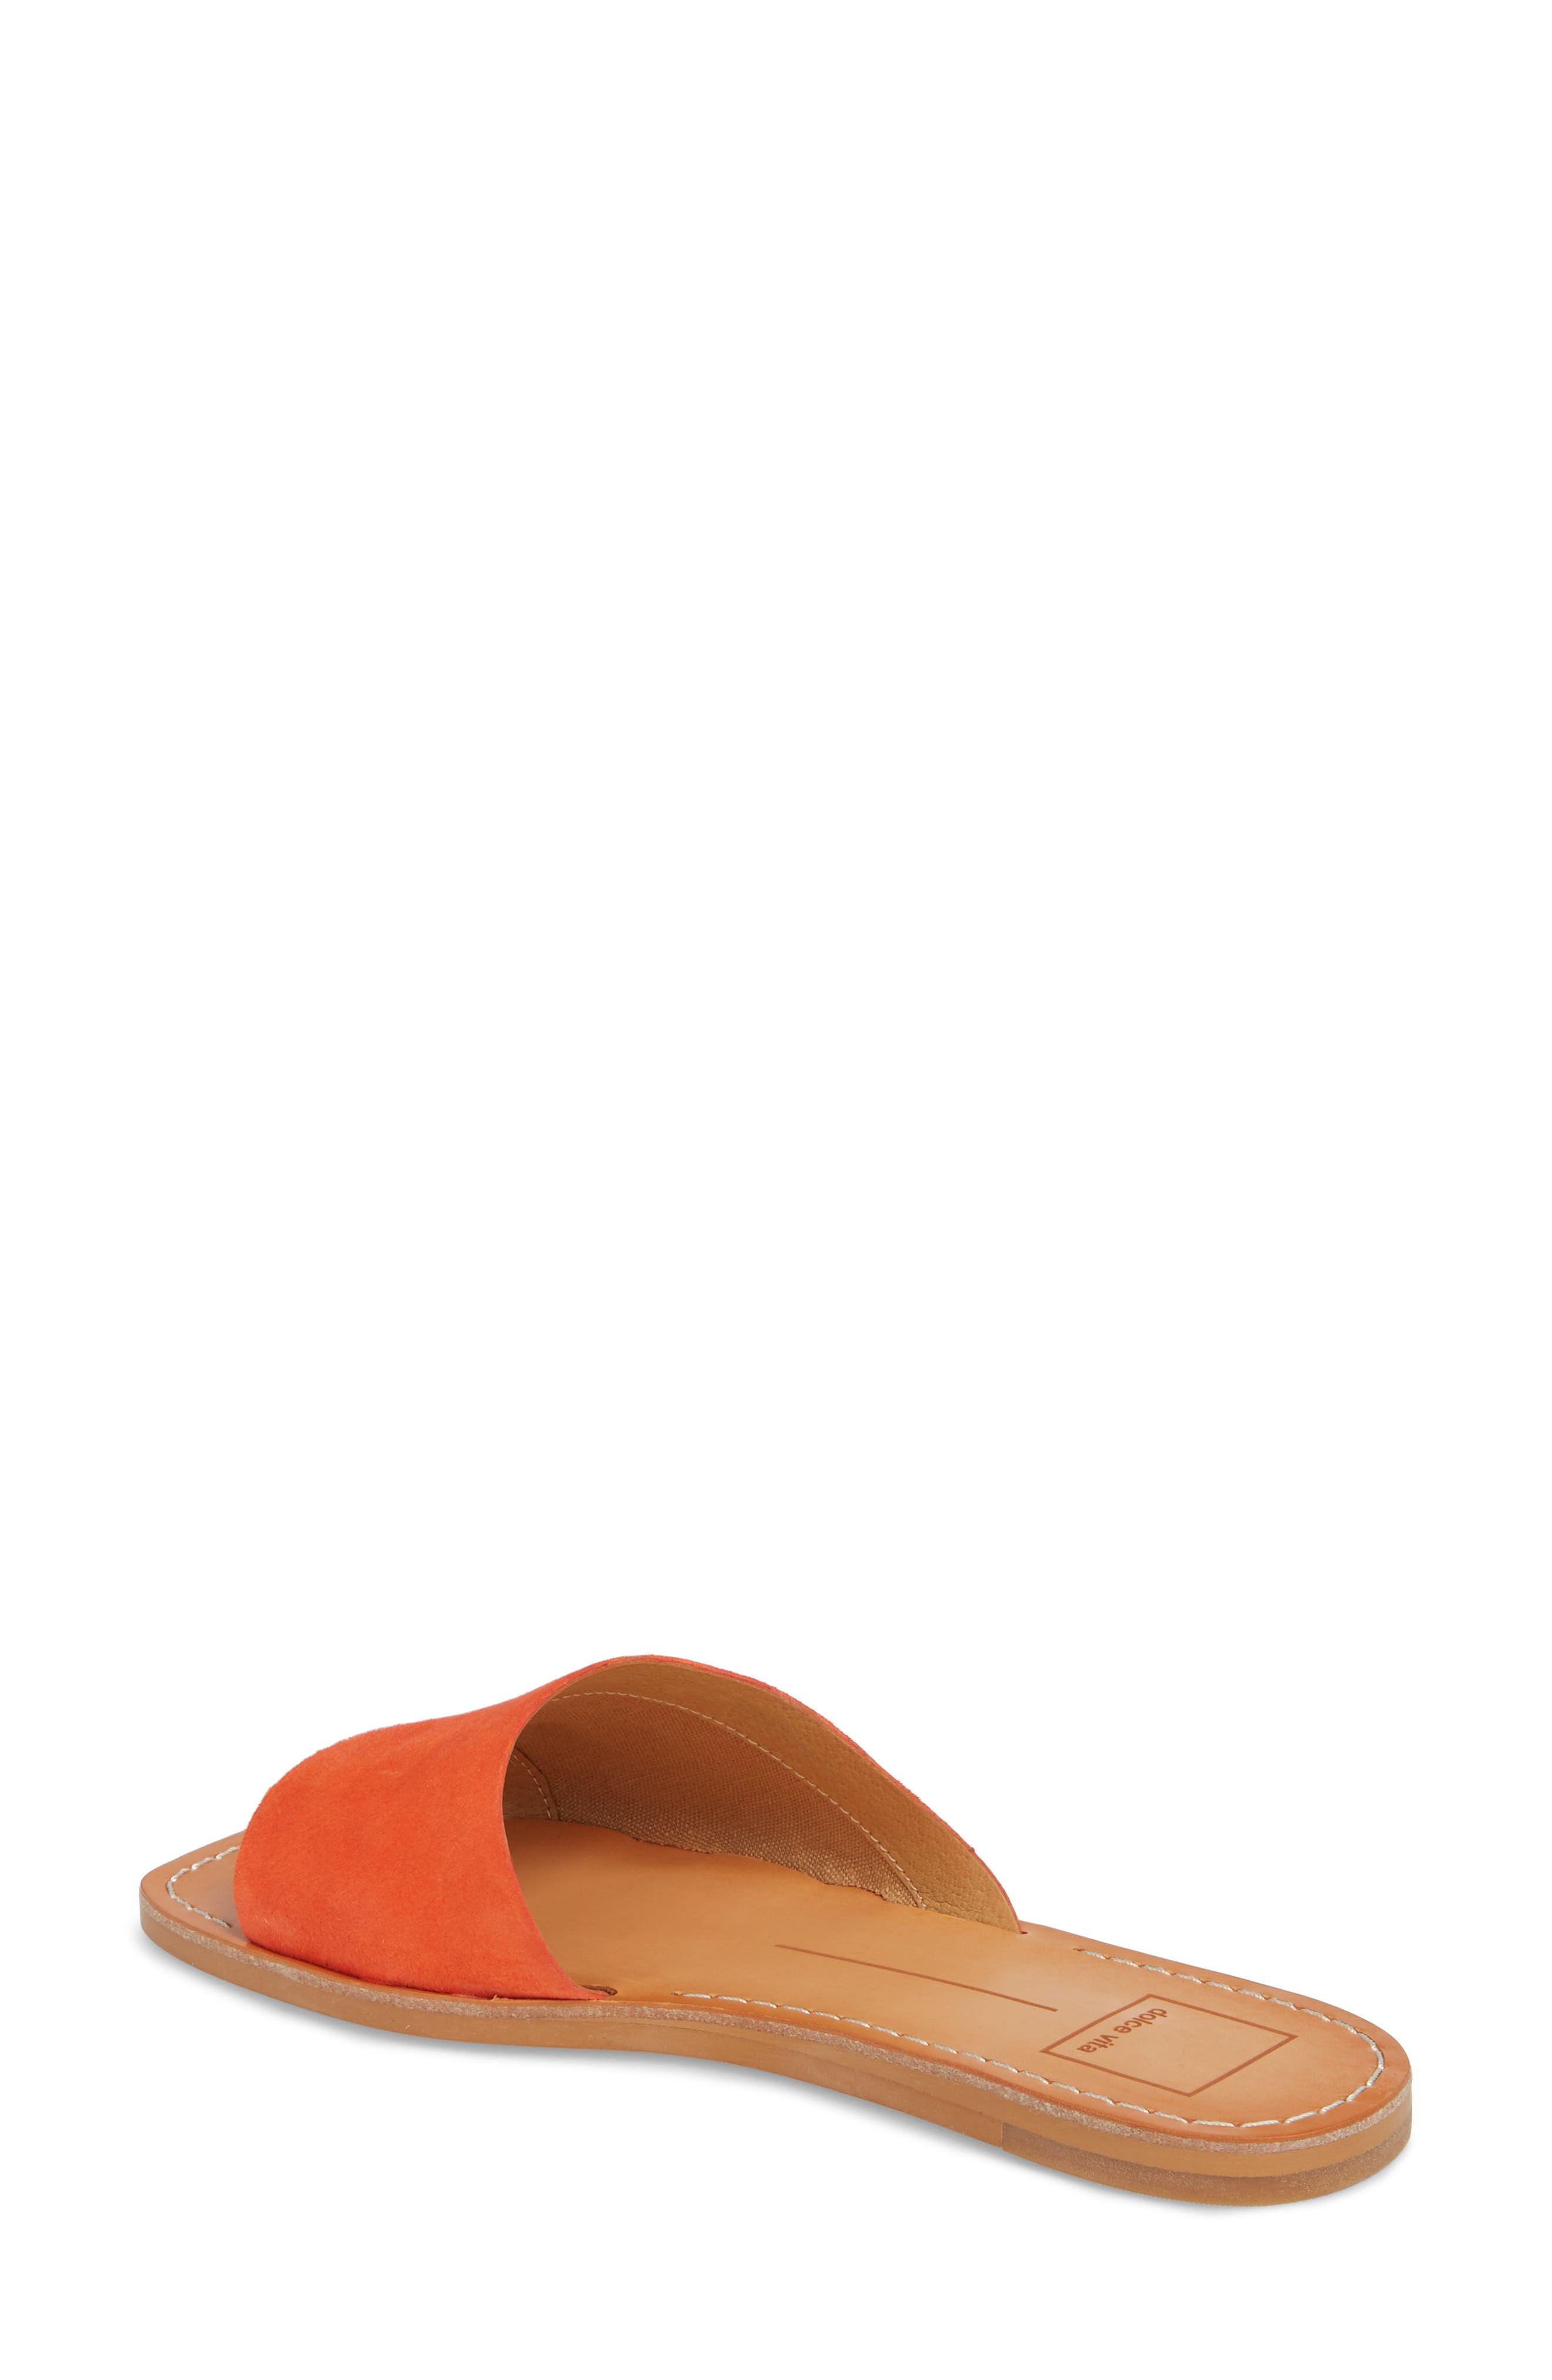 Cato Asymmetrical Slide Sandal,                             Alternate thumbnail 2, color,                             Orange Suede